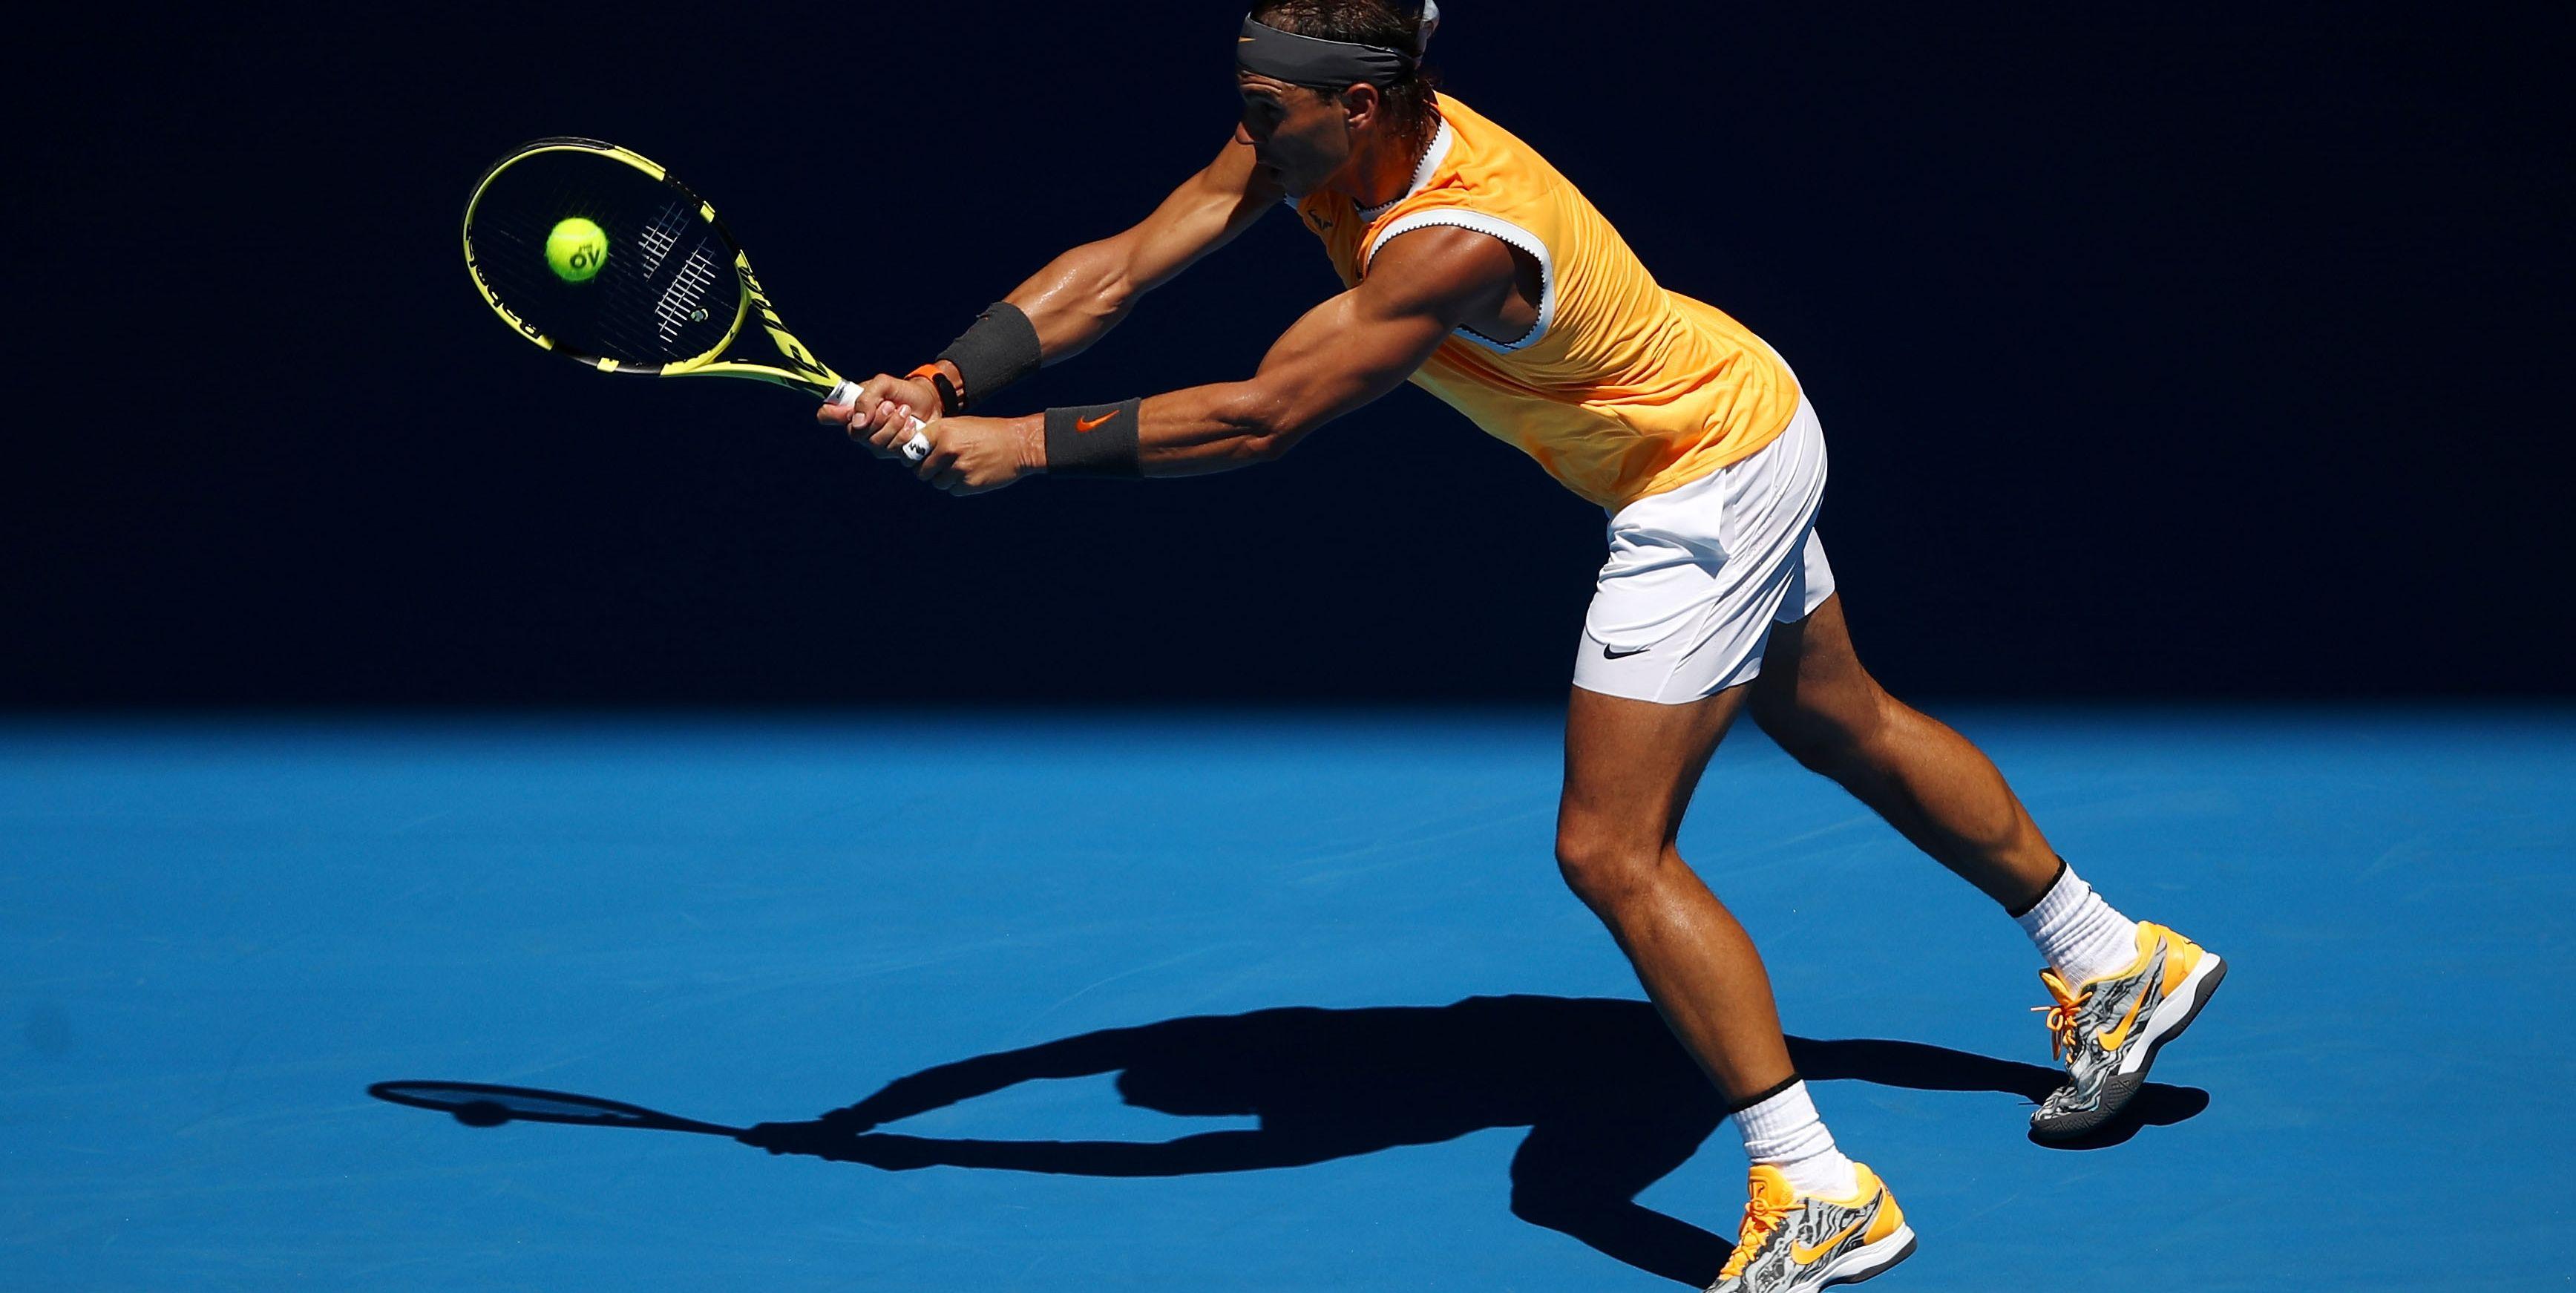 Rafa Nadal 2019 Australian Open